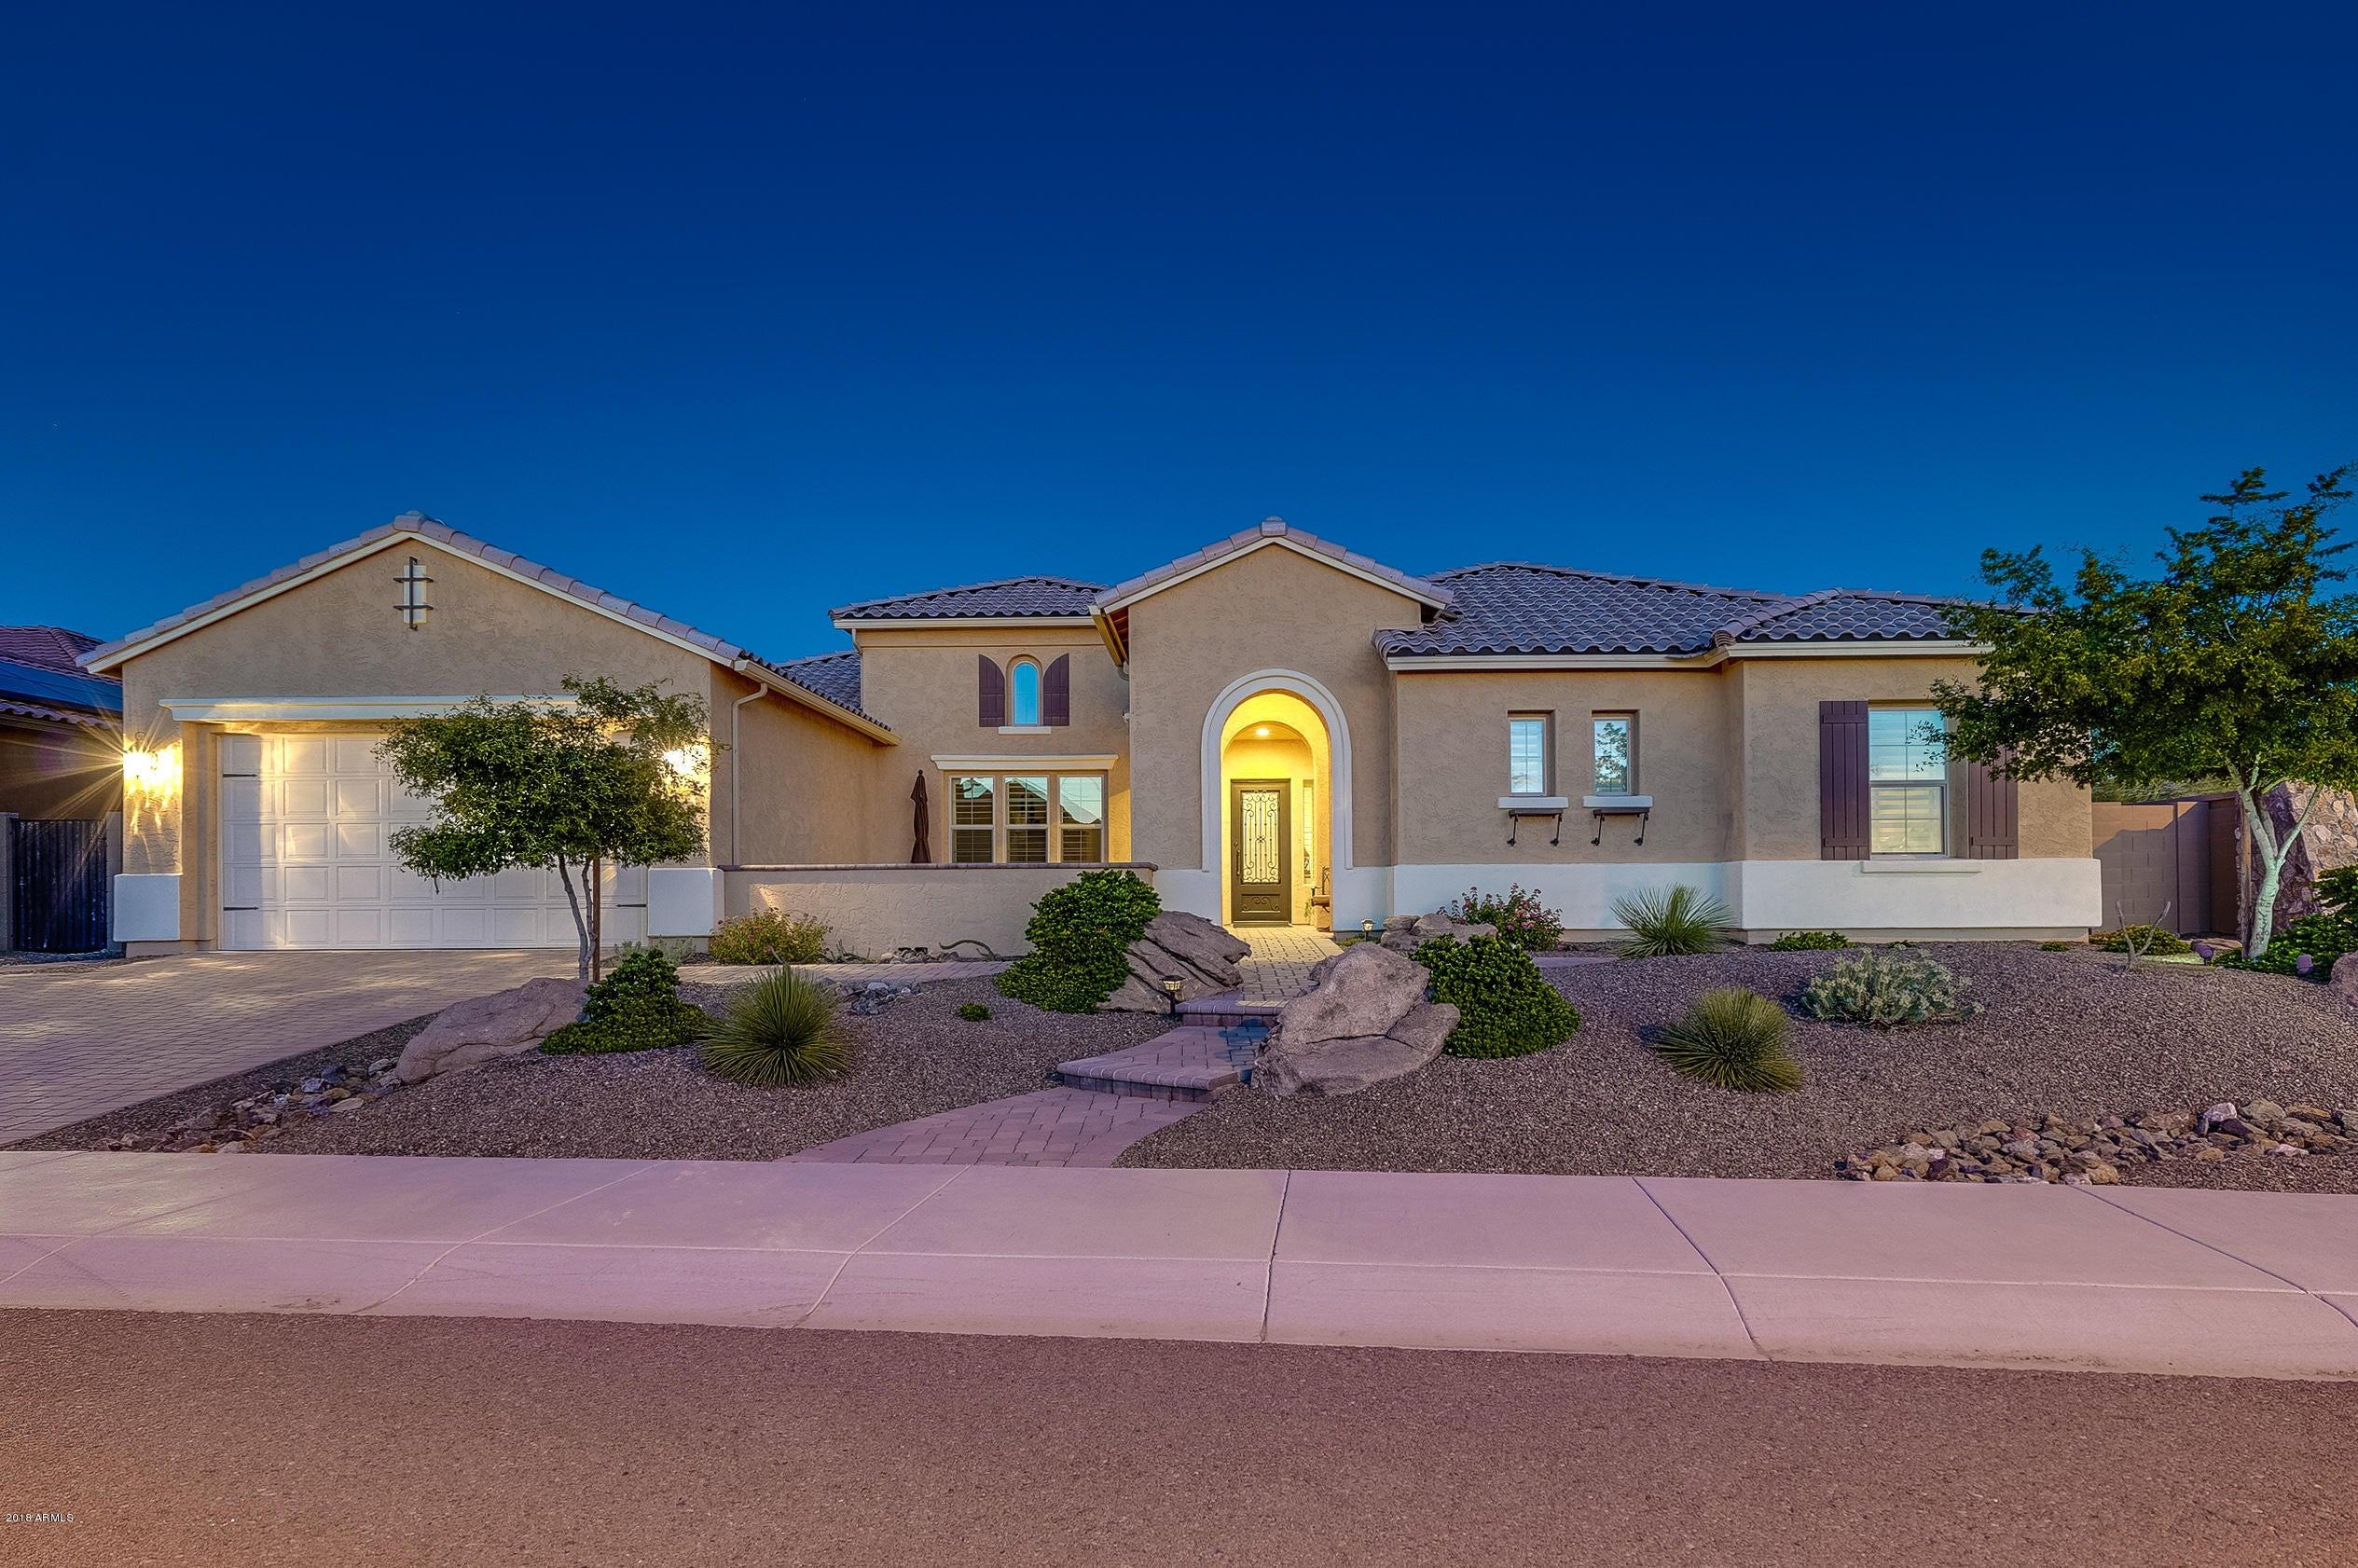 Photo of 27977 N 100TH Drive, Peoria, AZ 85383